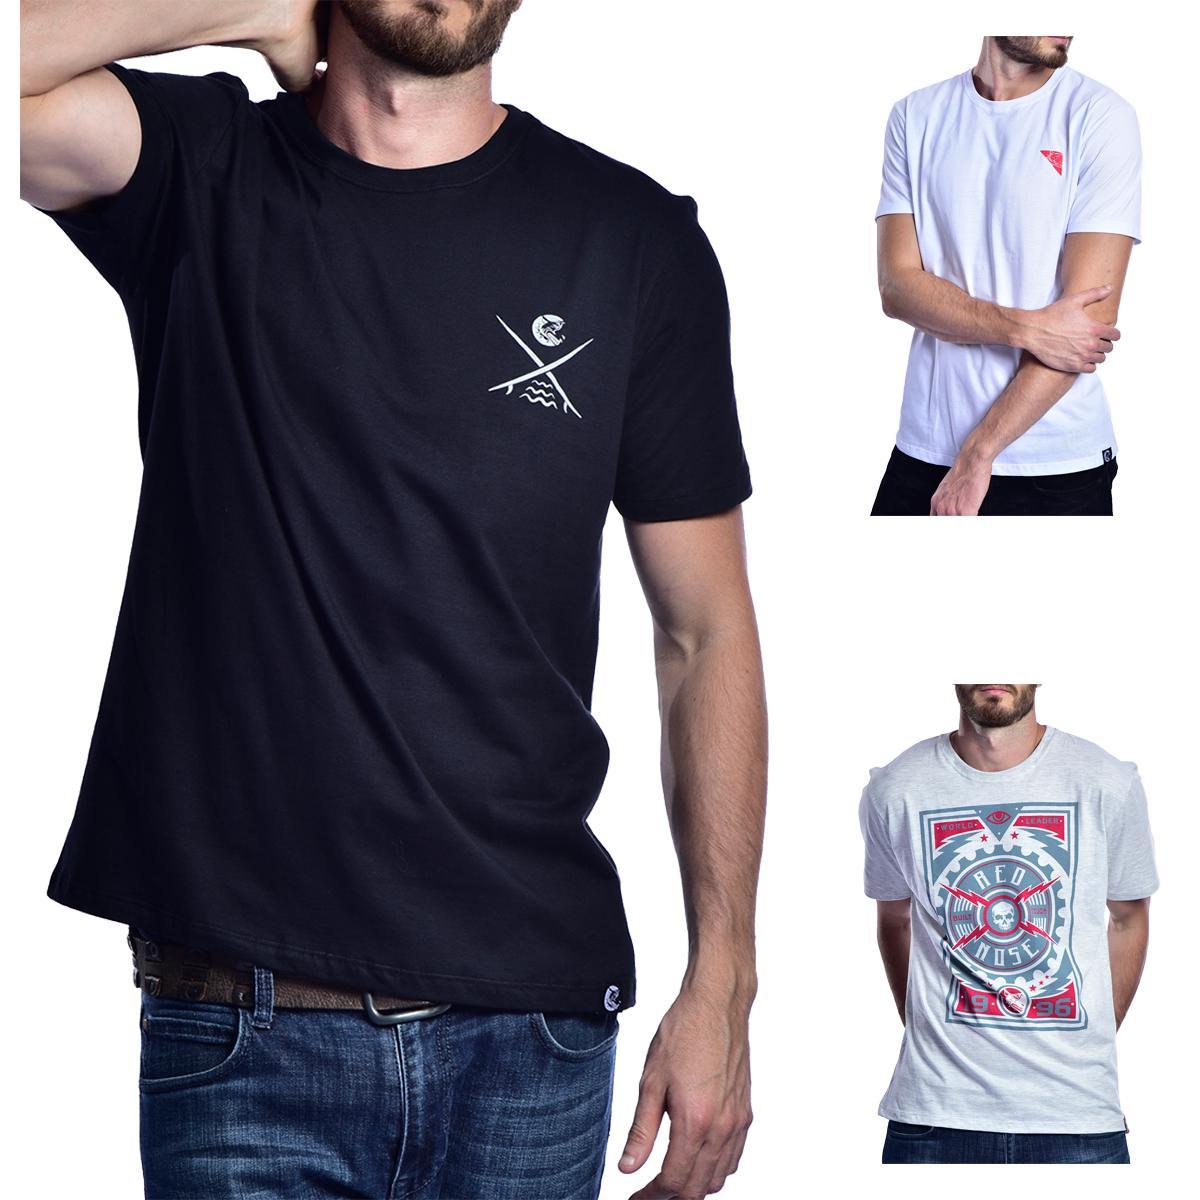 KIT 3 Camisetas Red Nose  - Preto e Branco e Cinza Escuro P